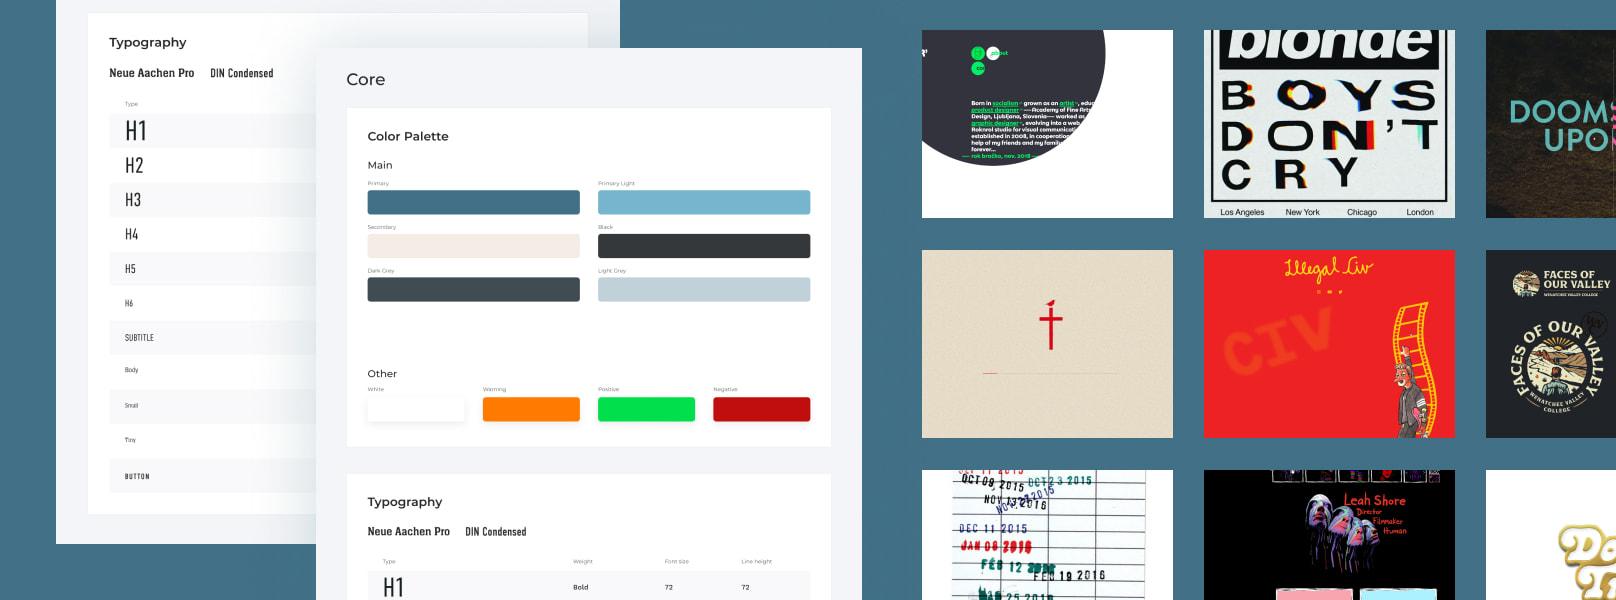 UI Kit & Moodboard